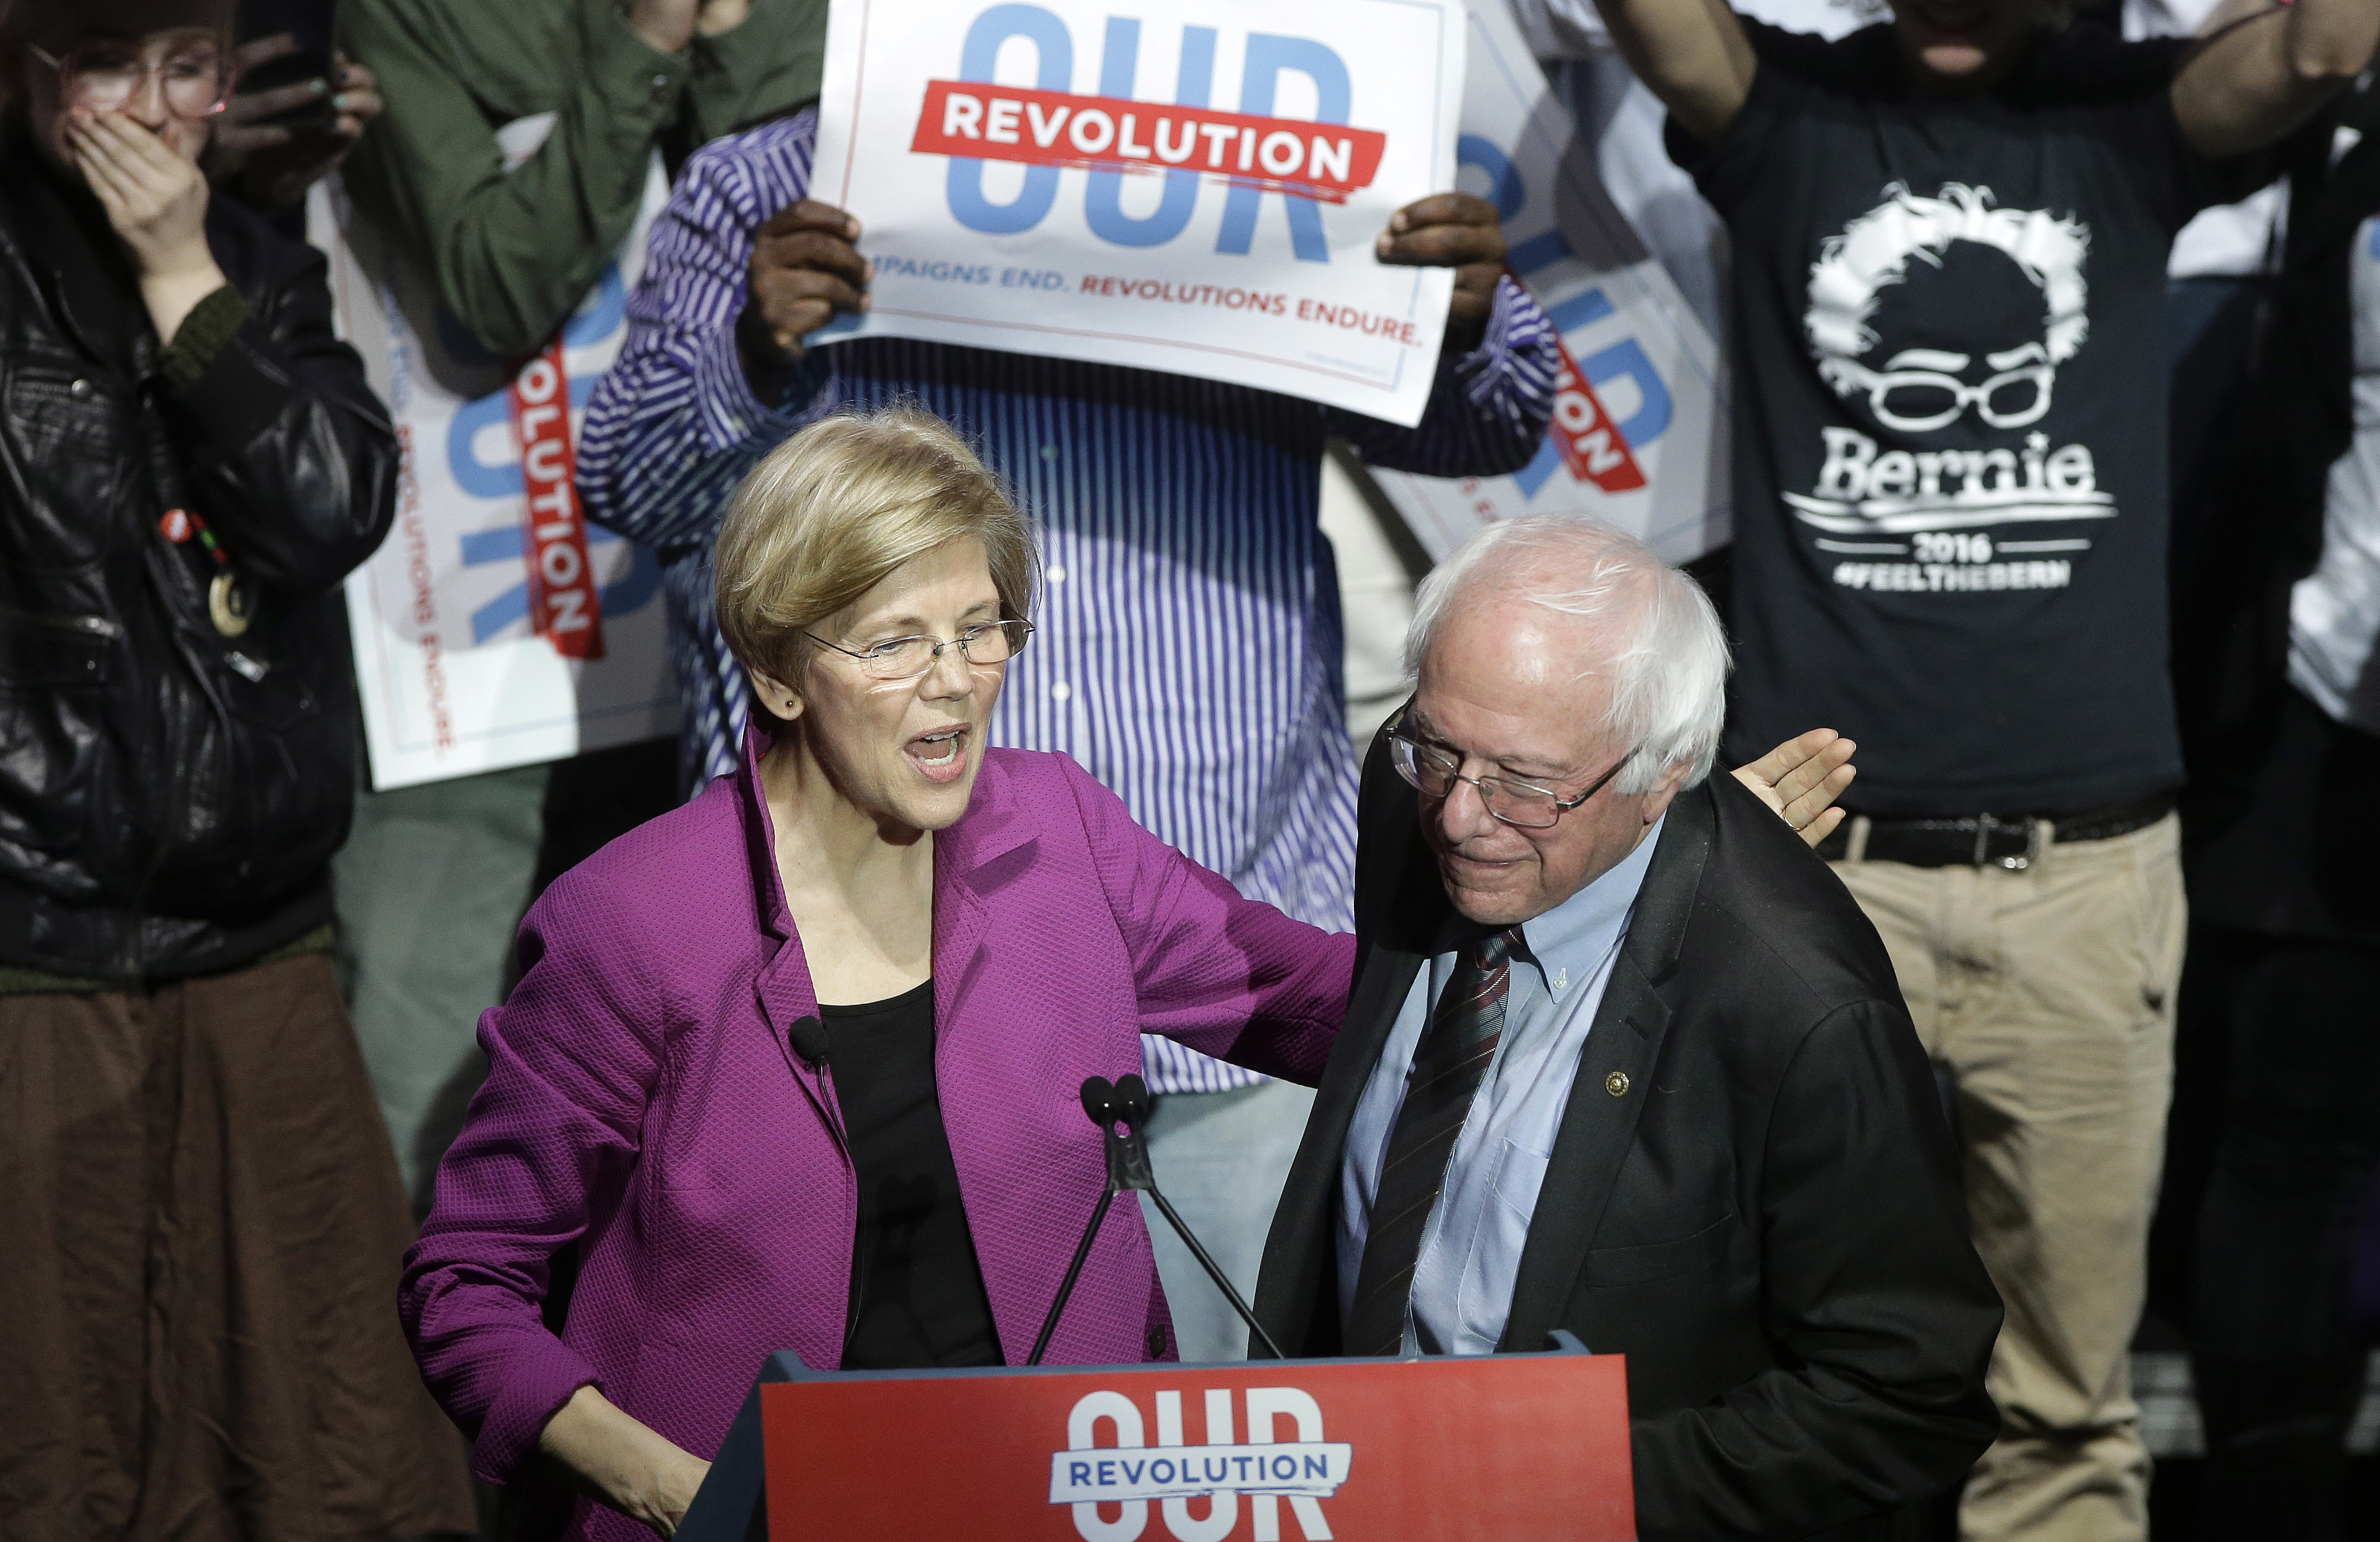 In 2020, Bernie Sanders must win the N.H. primary. Elizabeth Warren stands in his way